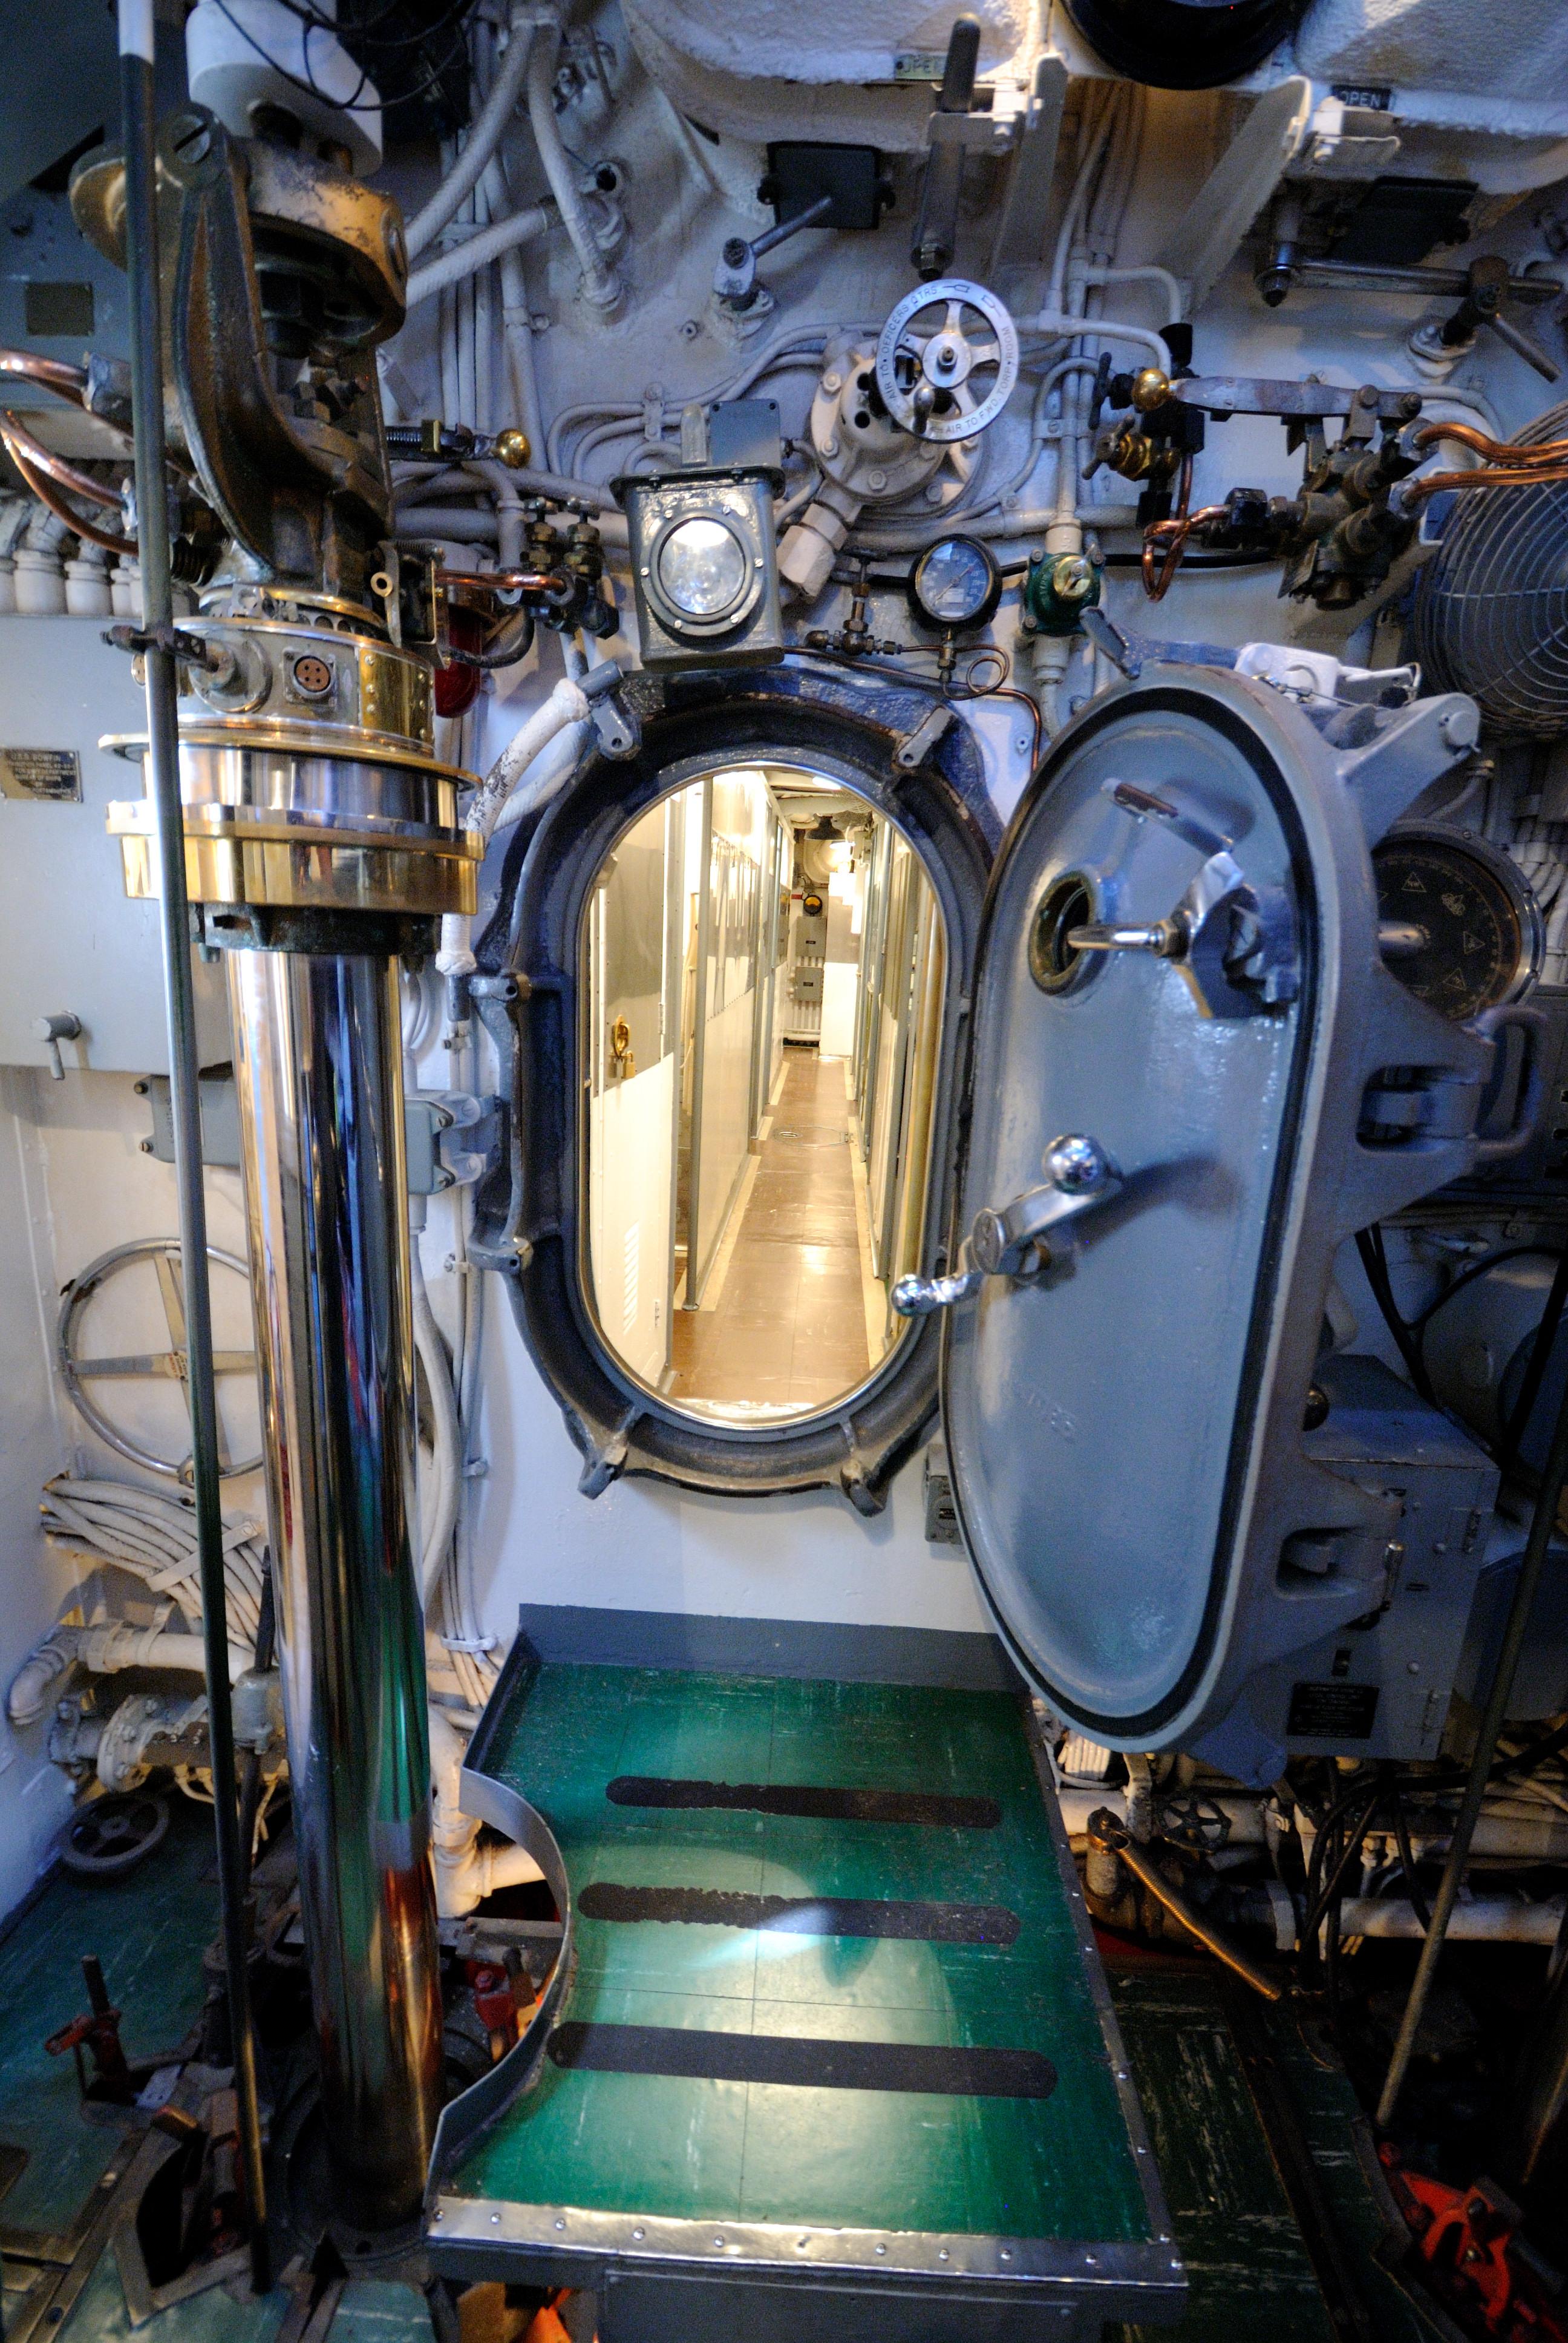 FileUSS Bowfin - Hatch Door (8326477479).jpg & File:USS Bowfin - Hatch Door (8326477479).jpg - Wikimedia Commons